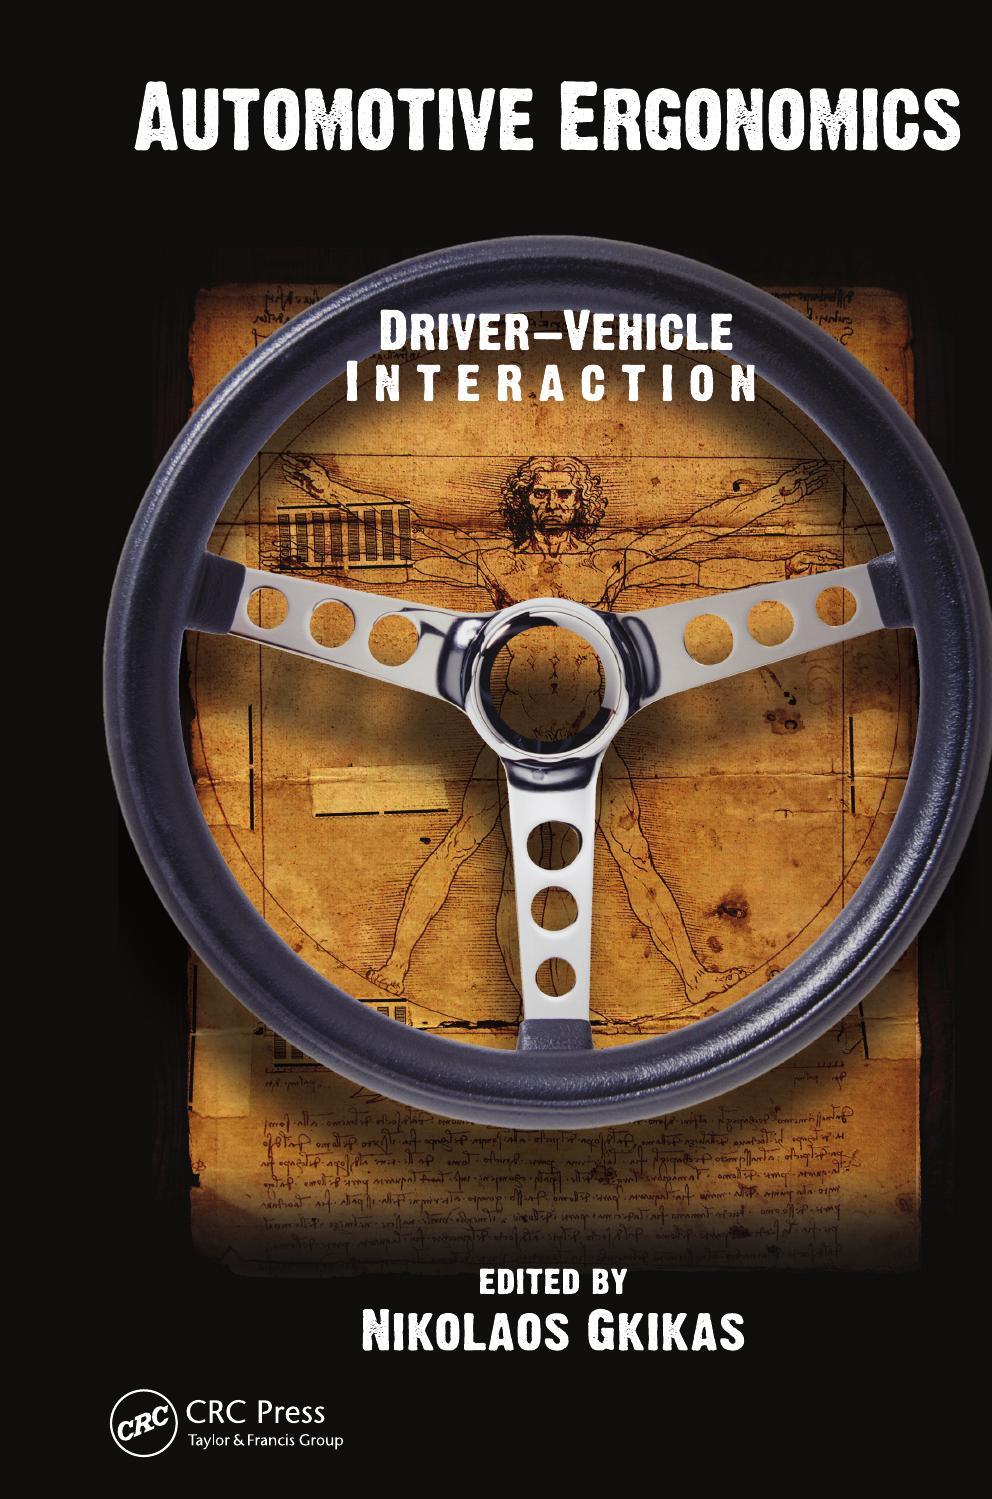 230182383 200362597 Automotive Ergonomics Driver Vehicle Interaction Pdf By Lkscunha Issuu